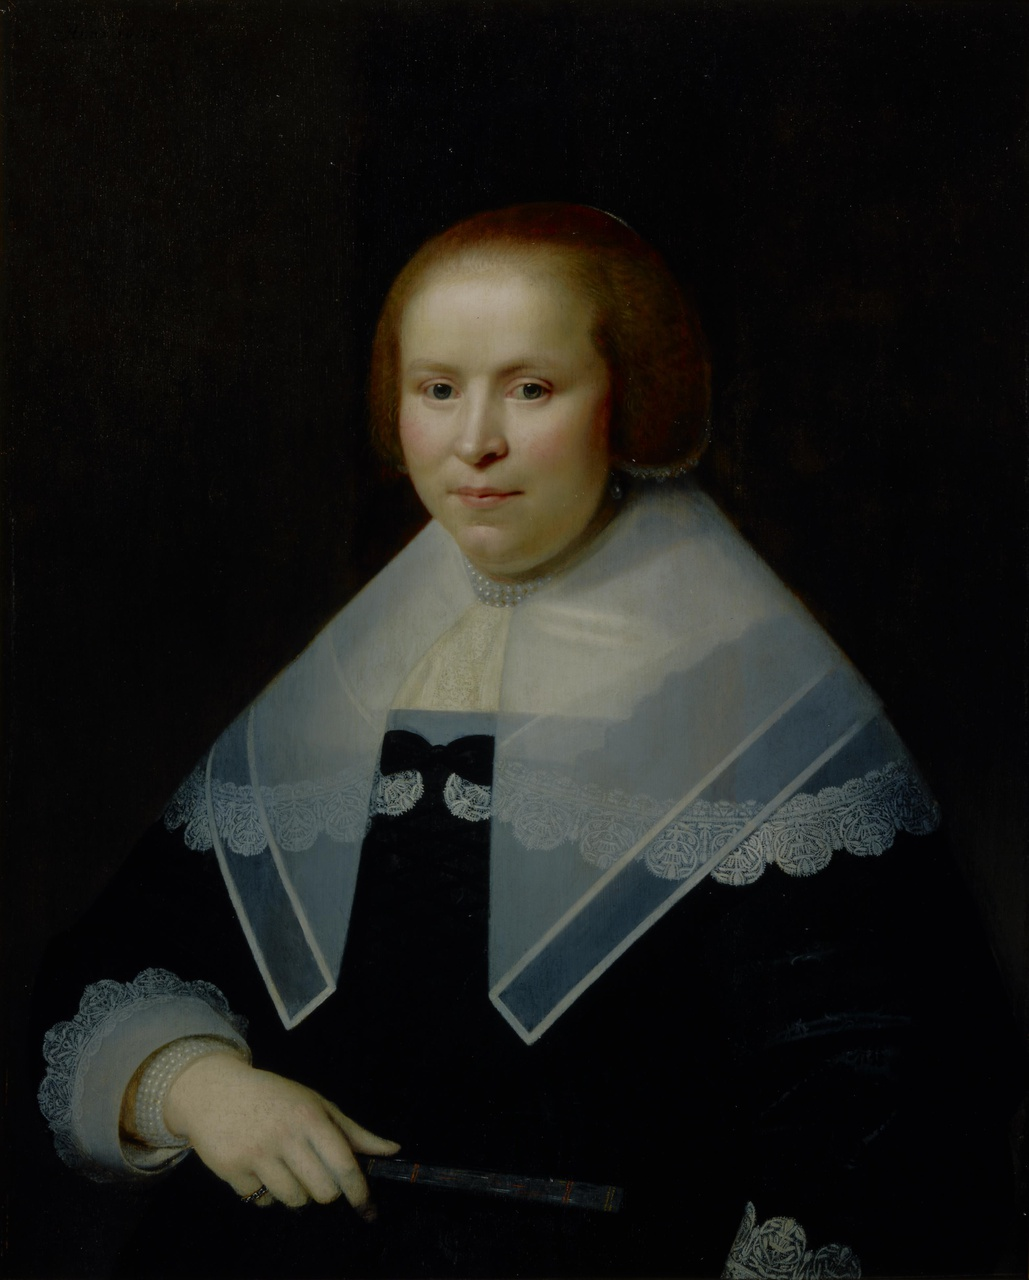 Portret van Jacoba Lampsins (1613/14-1667), echtgenote van Carel Martens